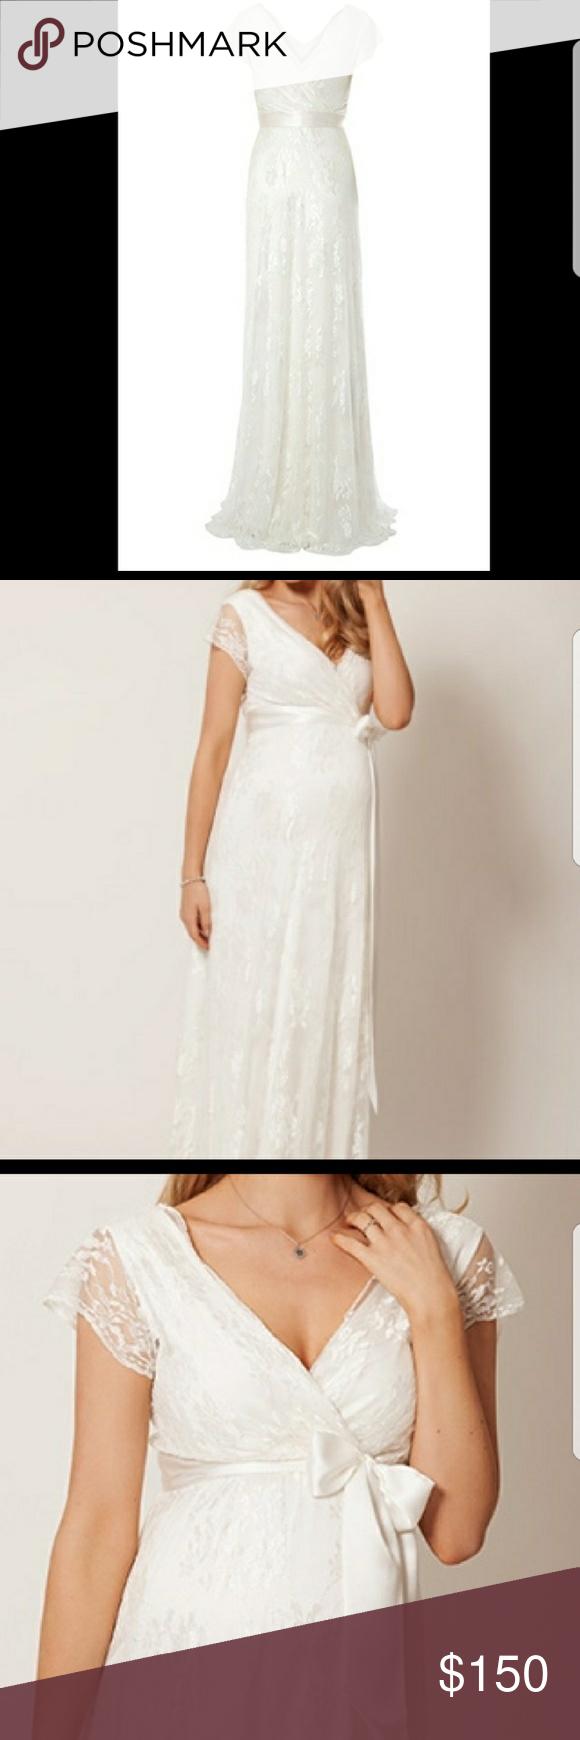 Maternity tiffany rose wedding dress bohemian lace wedding dress